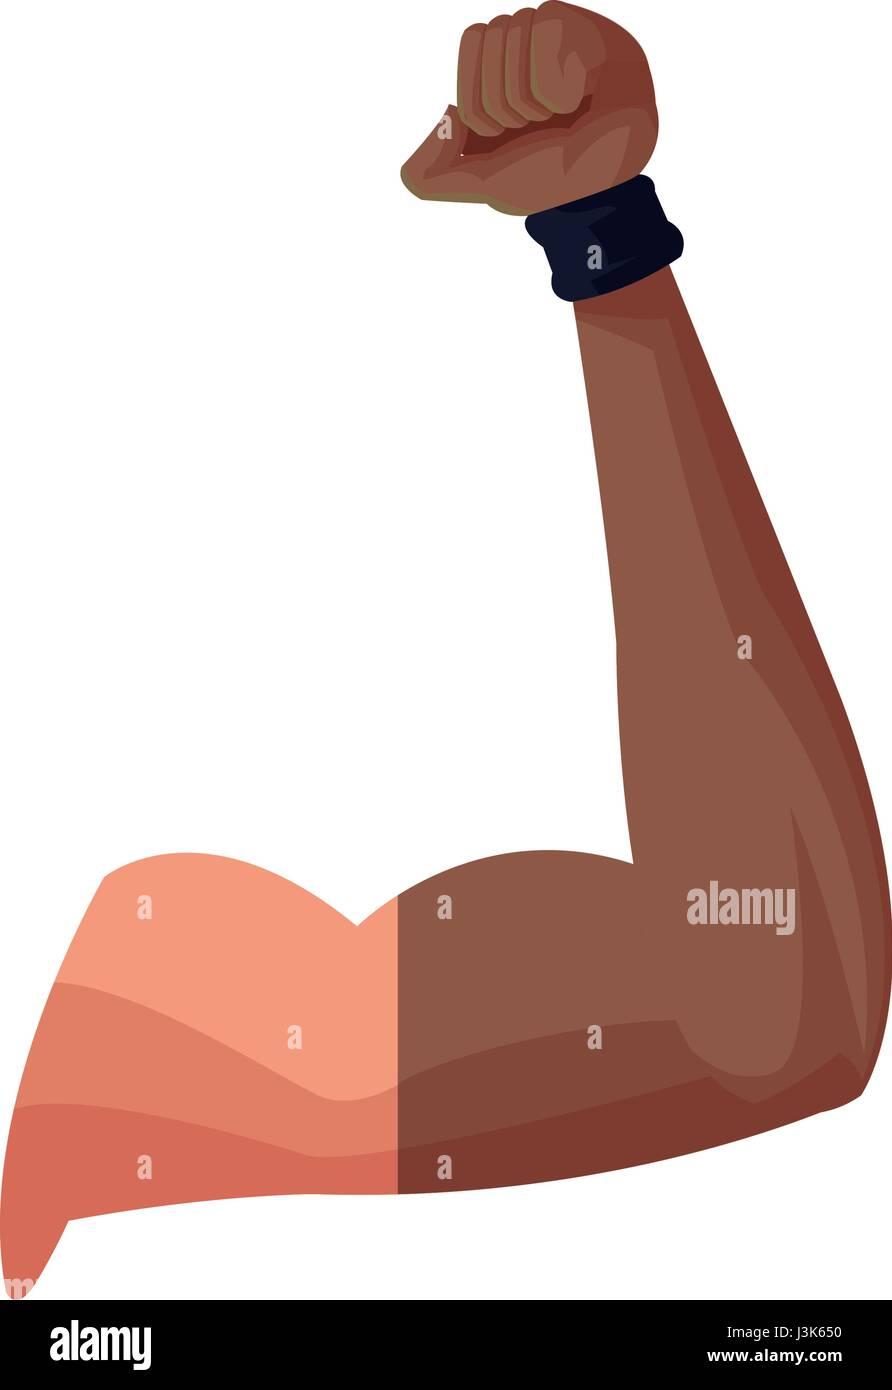 starker Arm Gym Muskel Design Grafik Vektor Abbildung - Bild ...